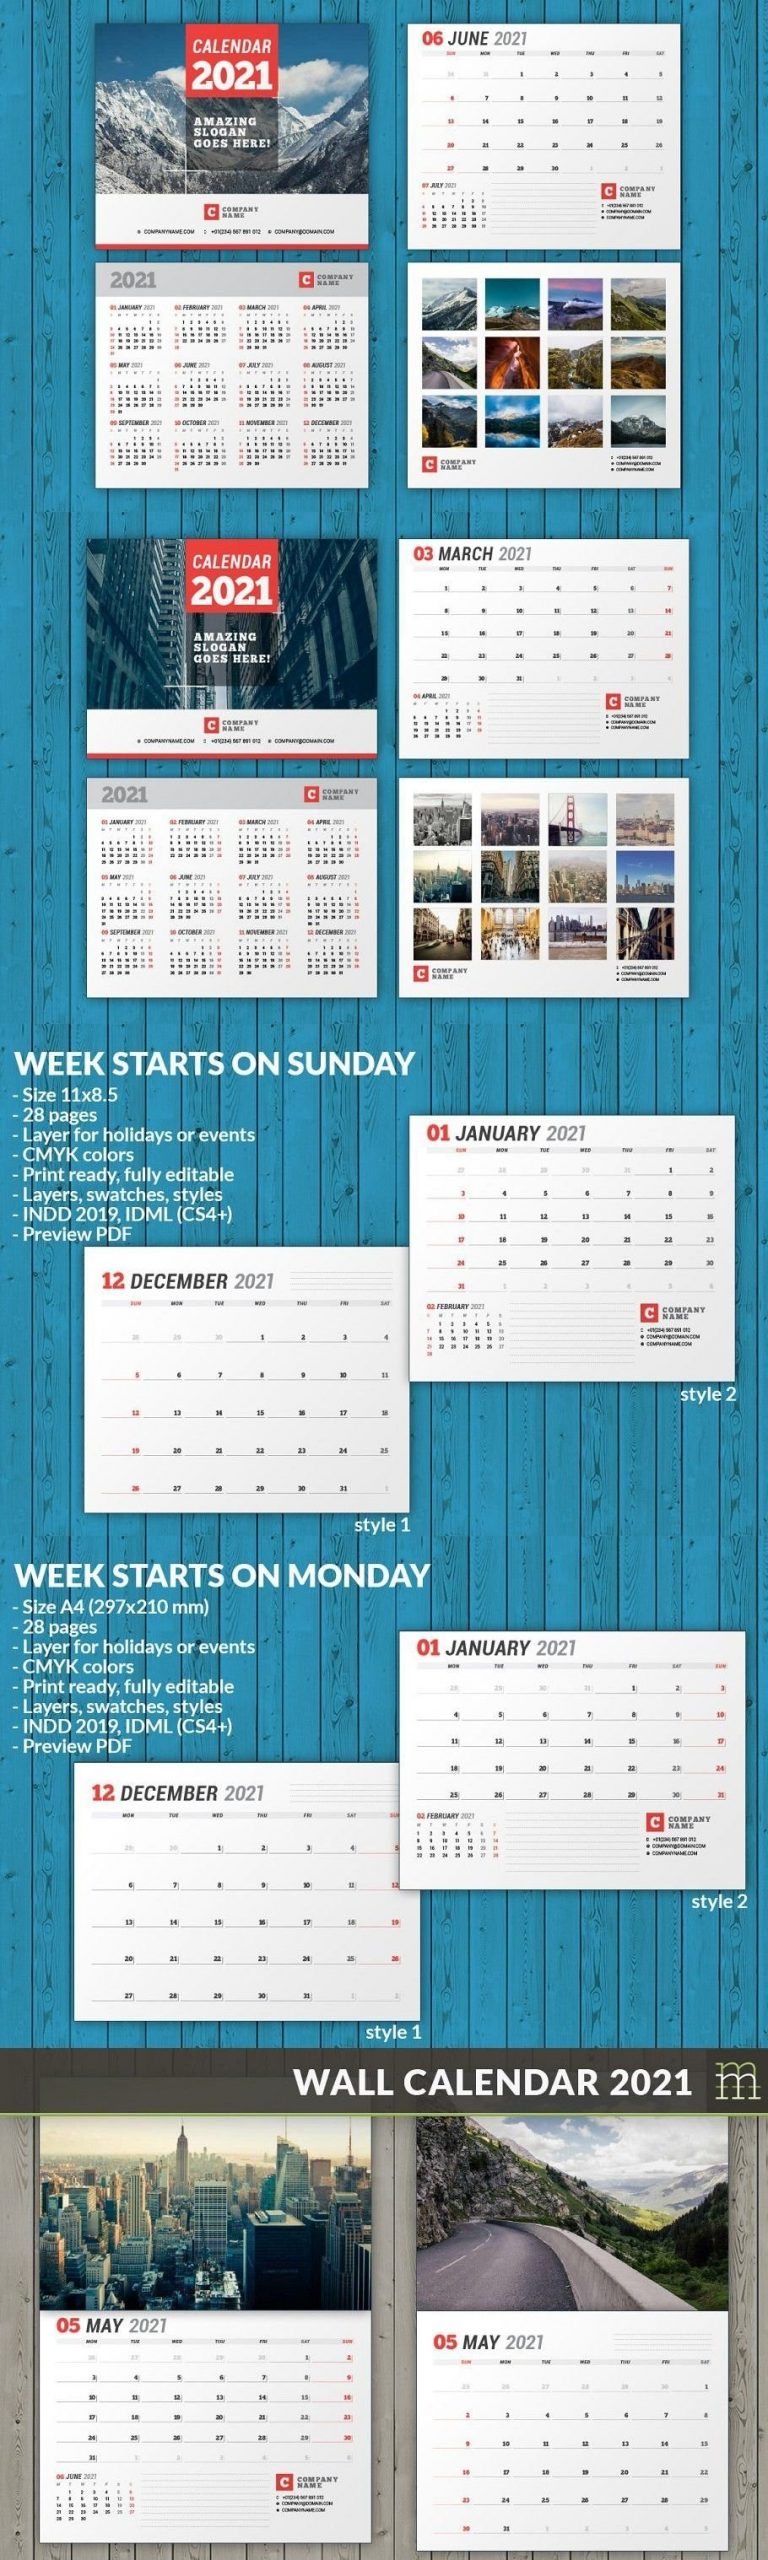 Wall Calendar 2021 (Wc037-21) In 2020   Wall Calendar, Calendar Template, Calendar 2020 intended for 2021 Indesign Calendar Template Graphics